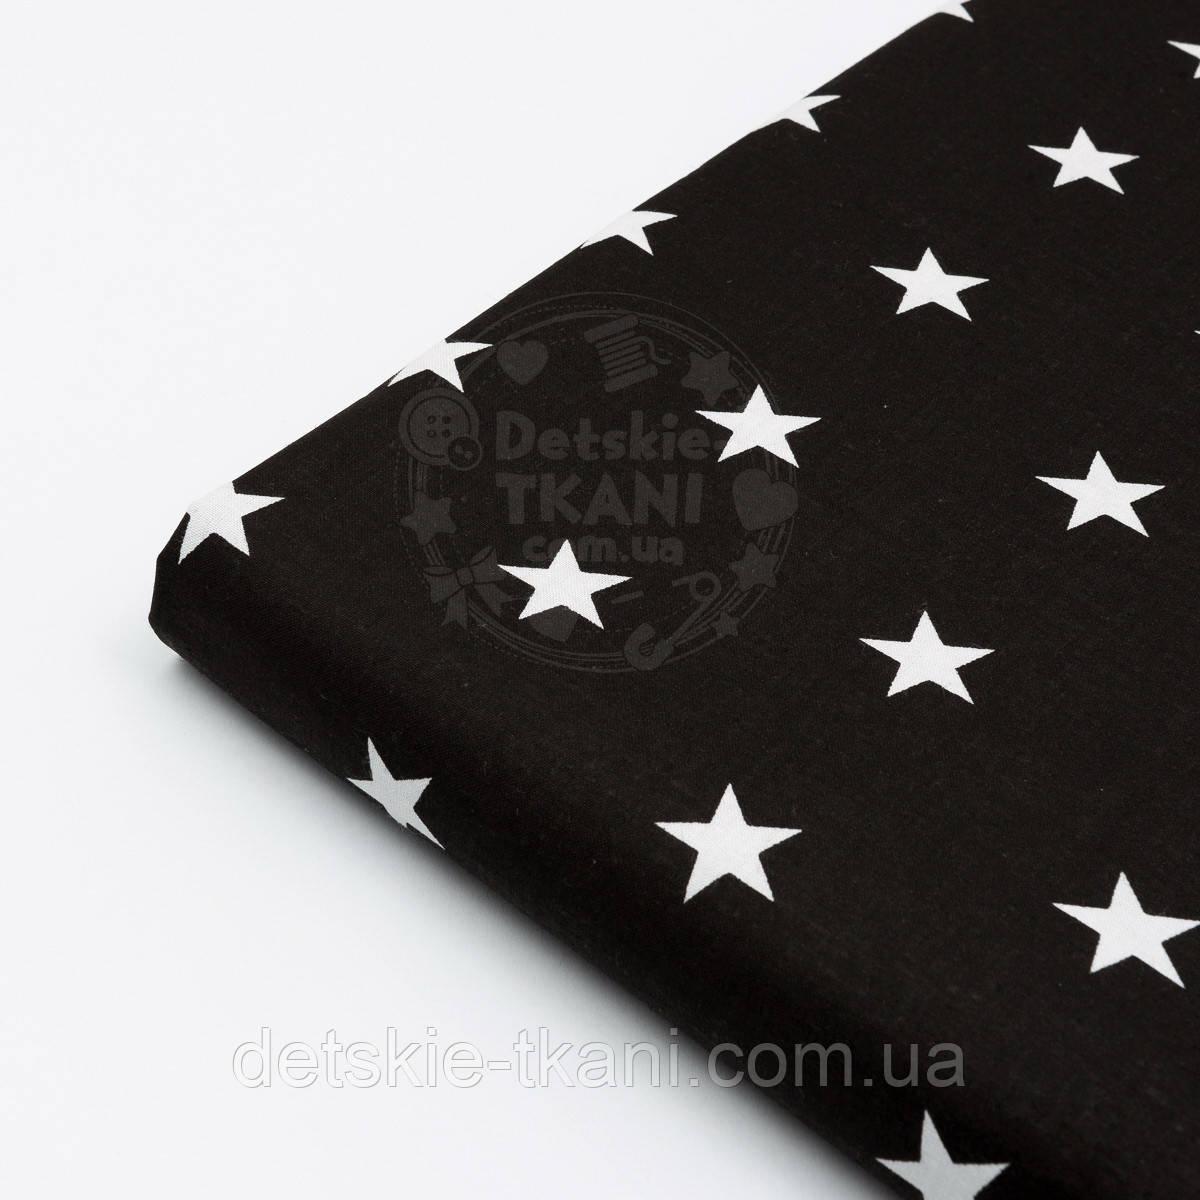 Отрез ткани №596  с белыми звёздами на чёрном фоне, размер 50*160 см